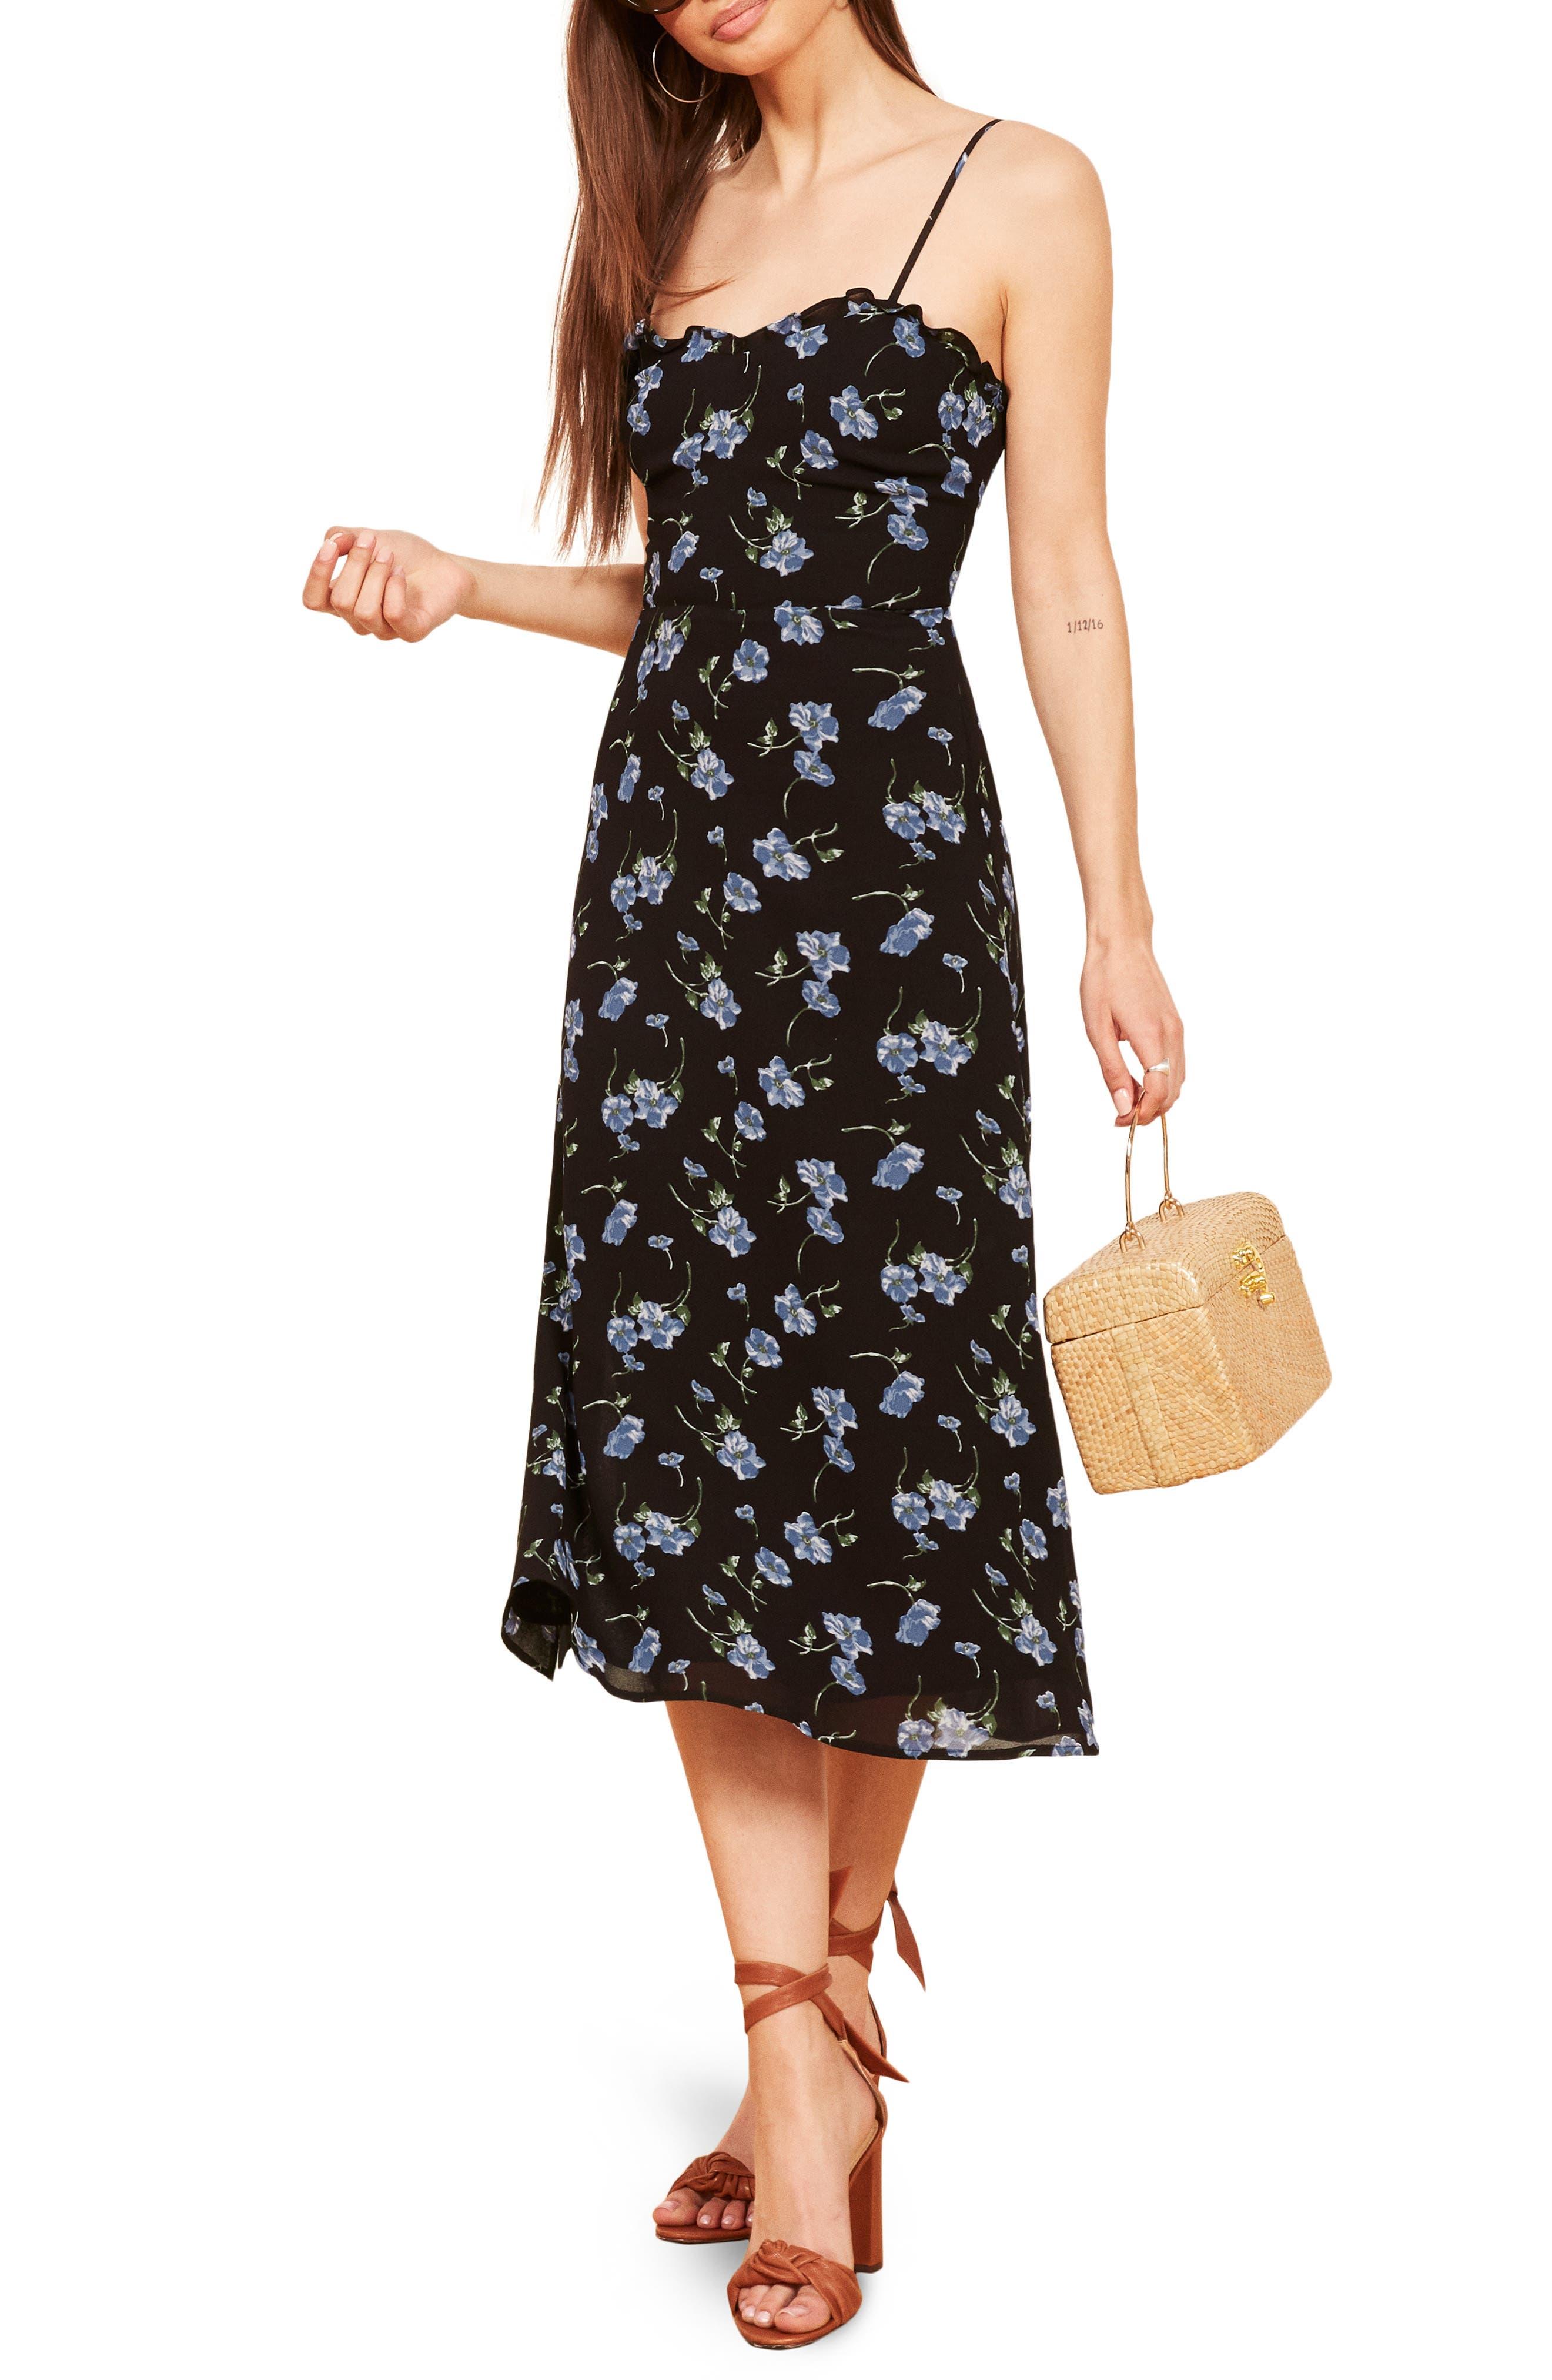 REFORMATION Cassandra Floral Dress, Main, color, 001